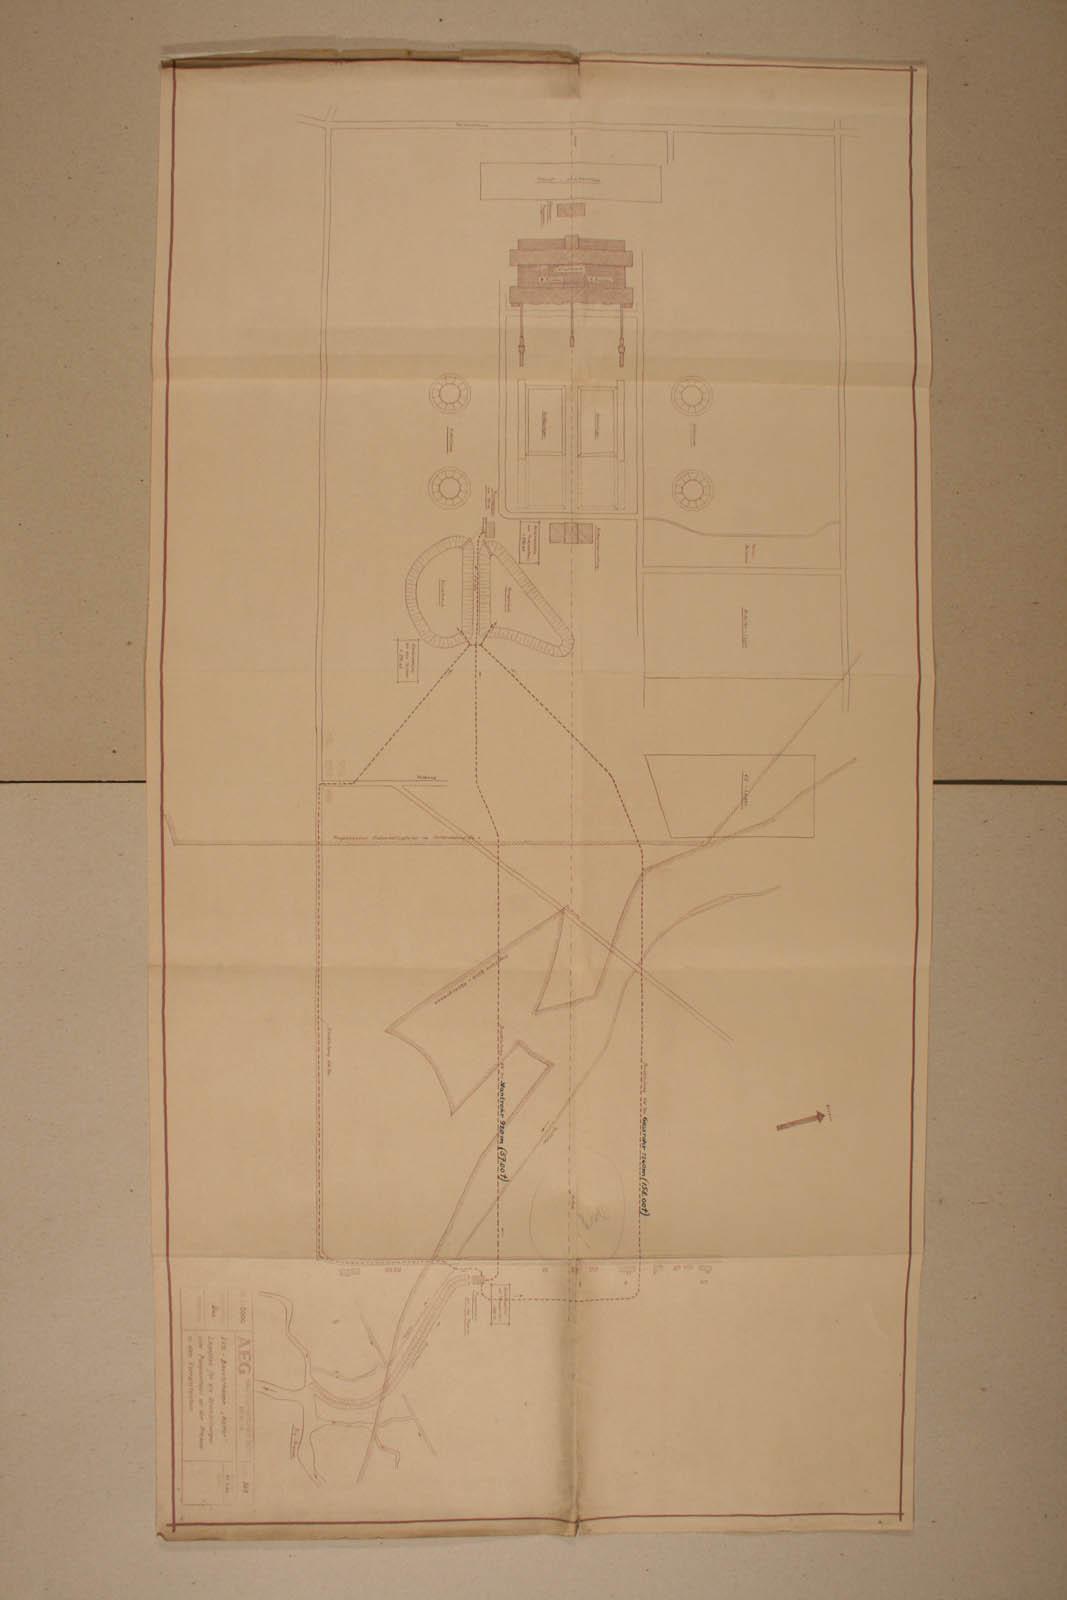 Archiwum Panstwowe w Katowicach Land 879 70 1 20